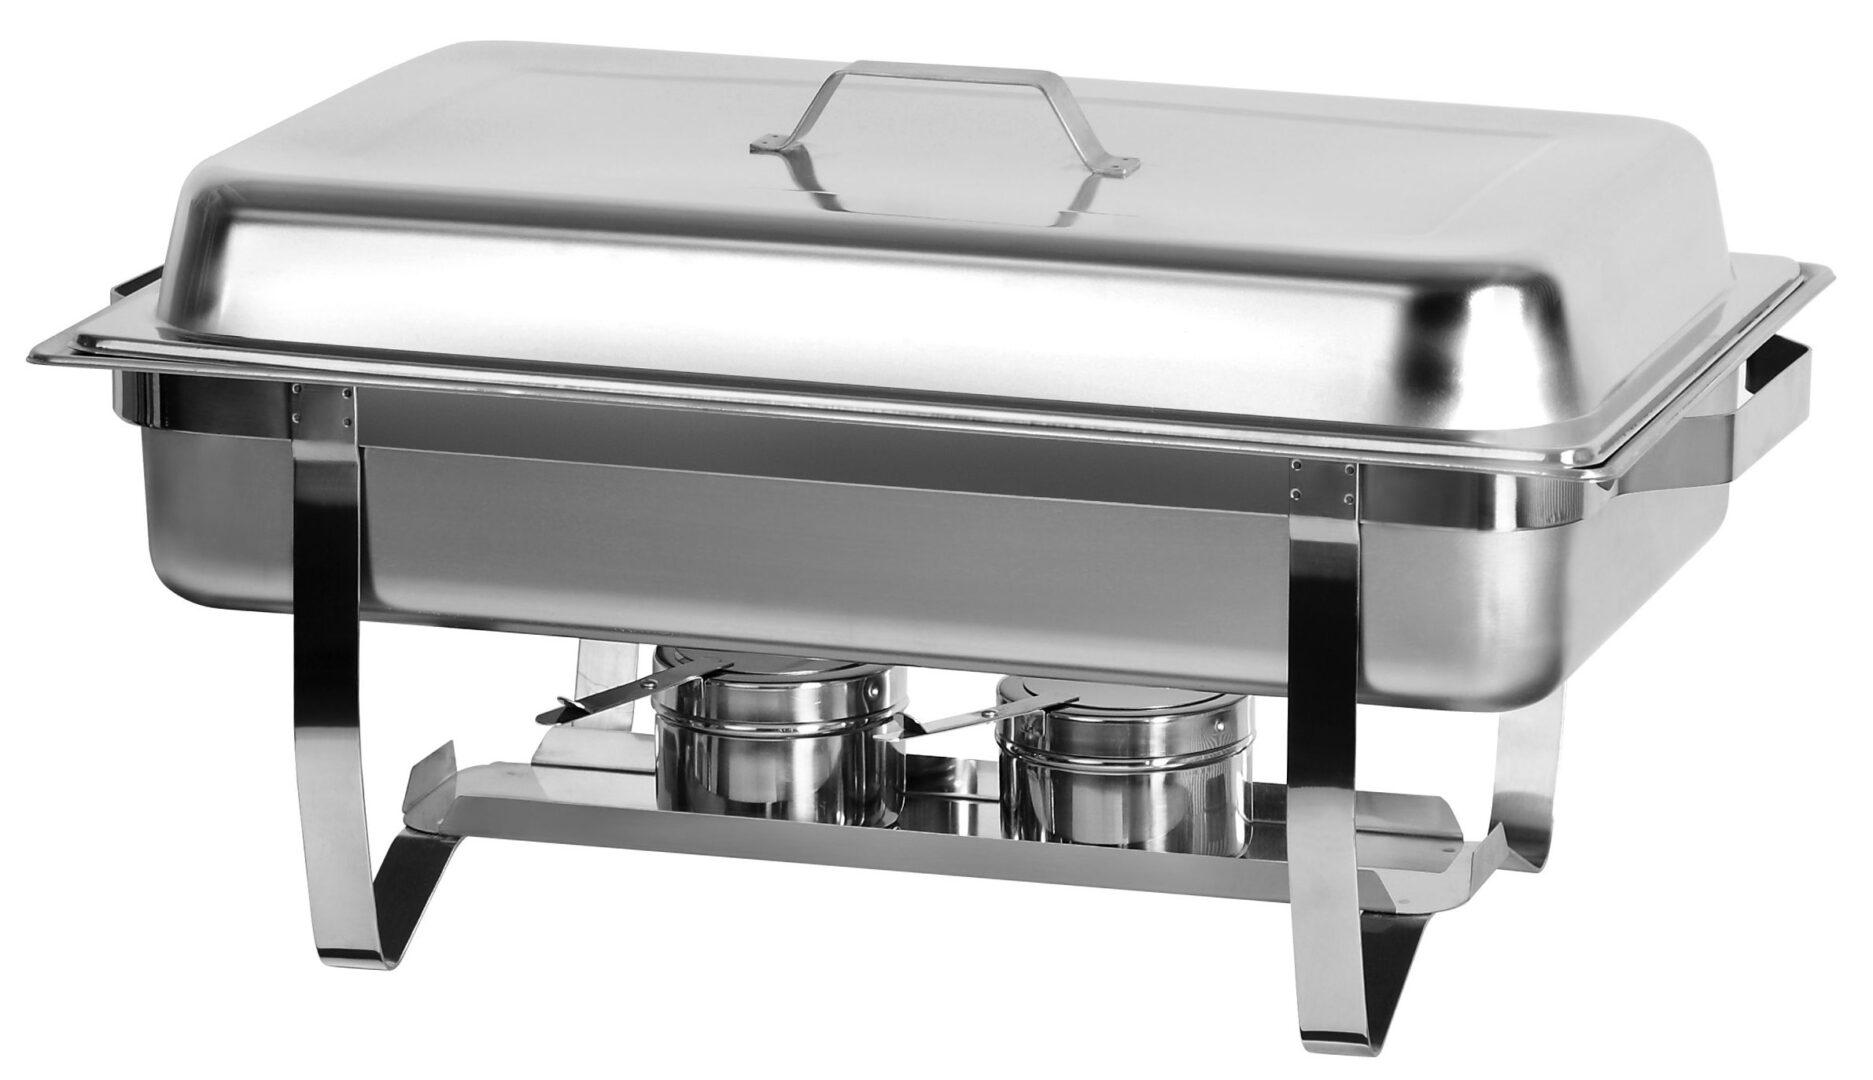 Mixrite AT761L63-1 Economic Oblong Chafing Dish 600x360x300